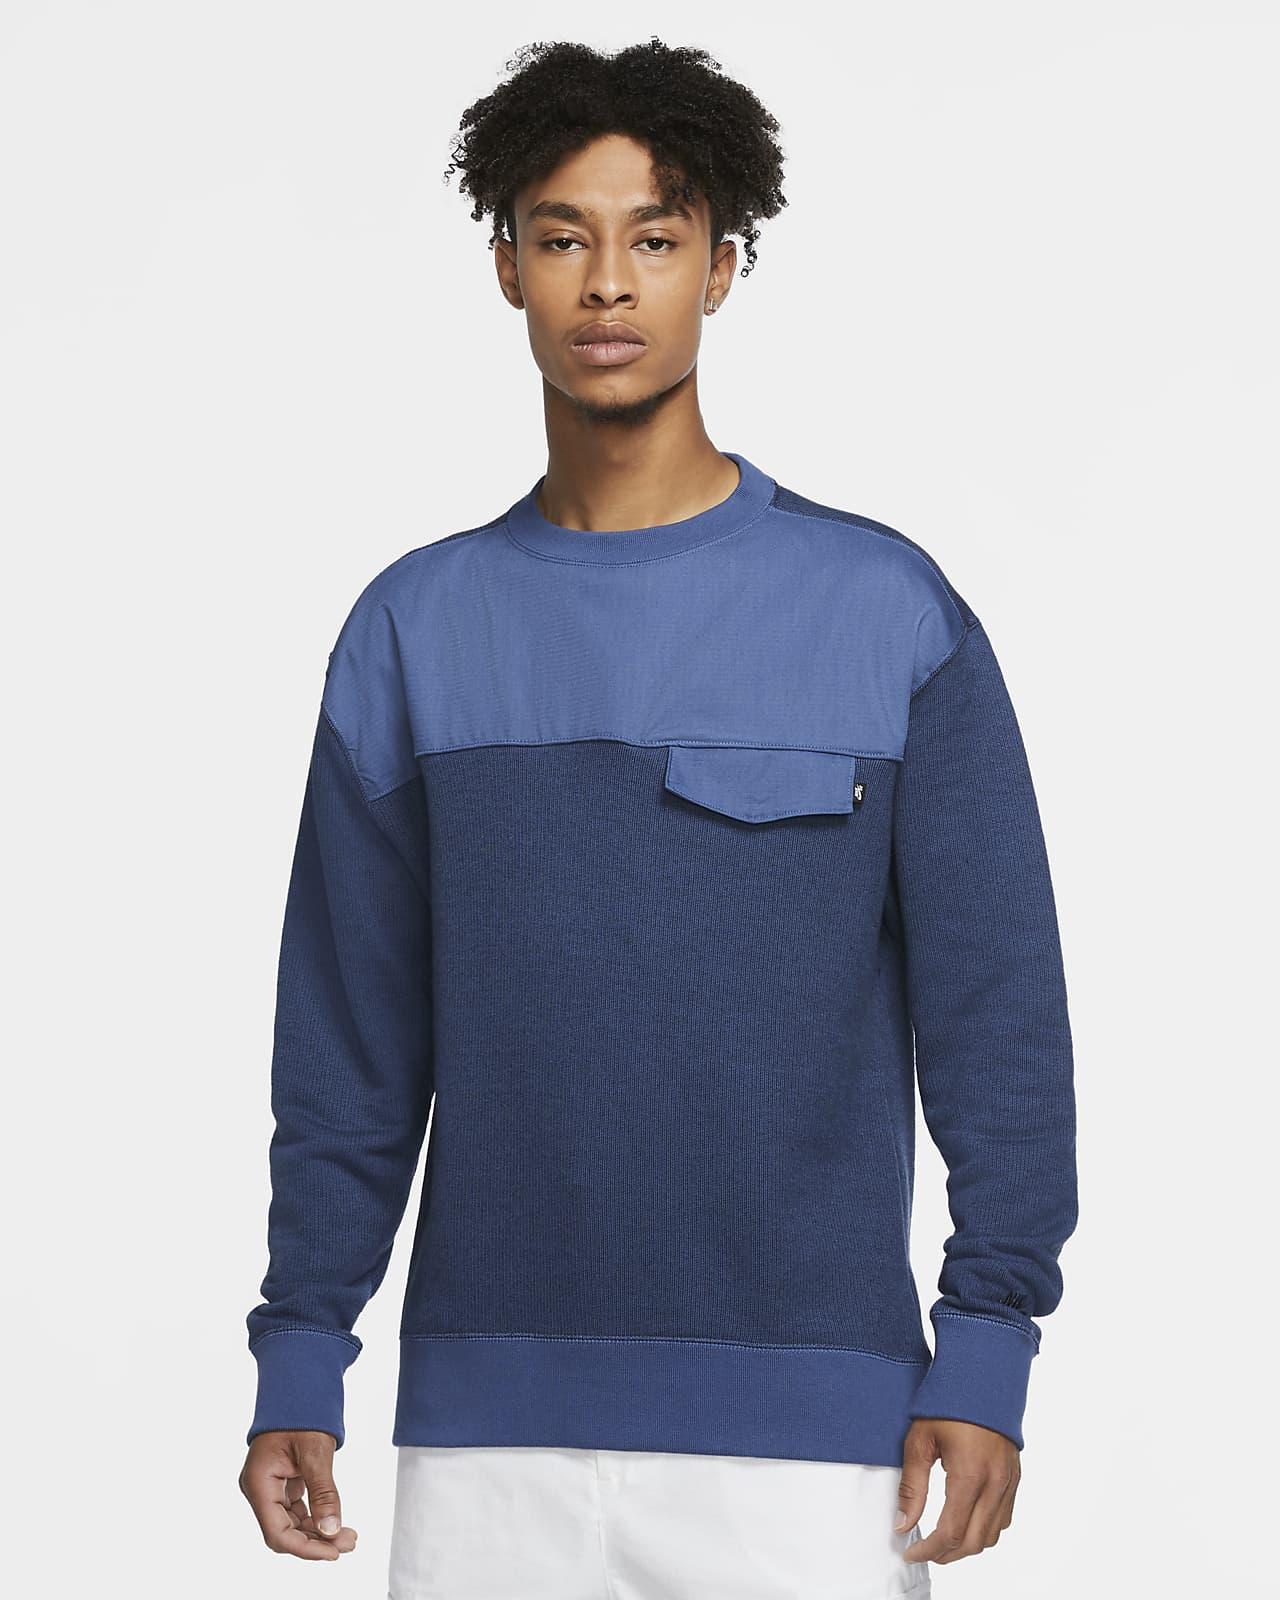 Camisola de skateboard Nike SB para homem